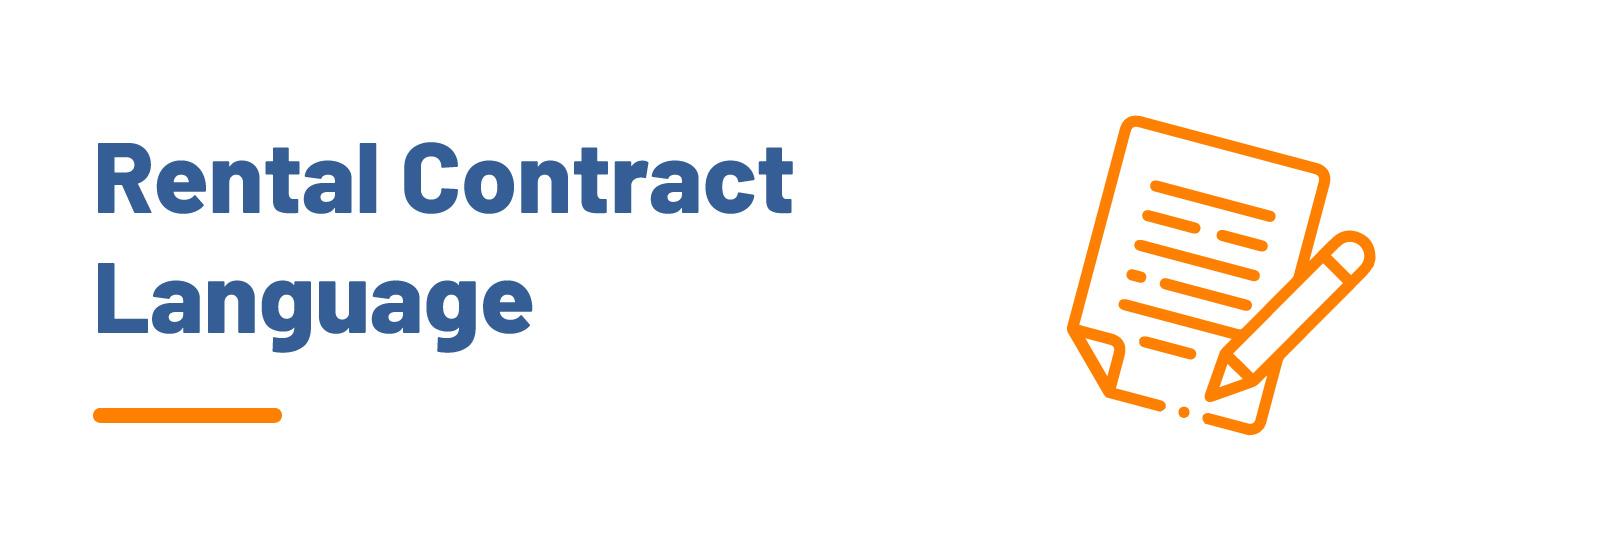 Rental Contract Language